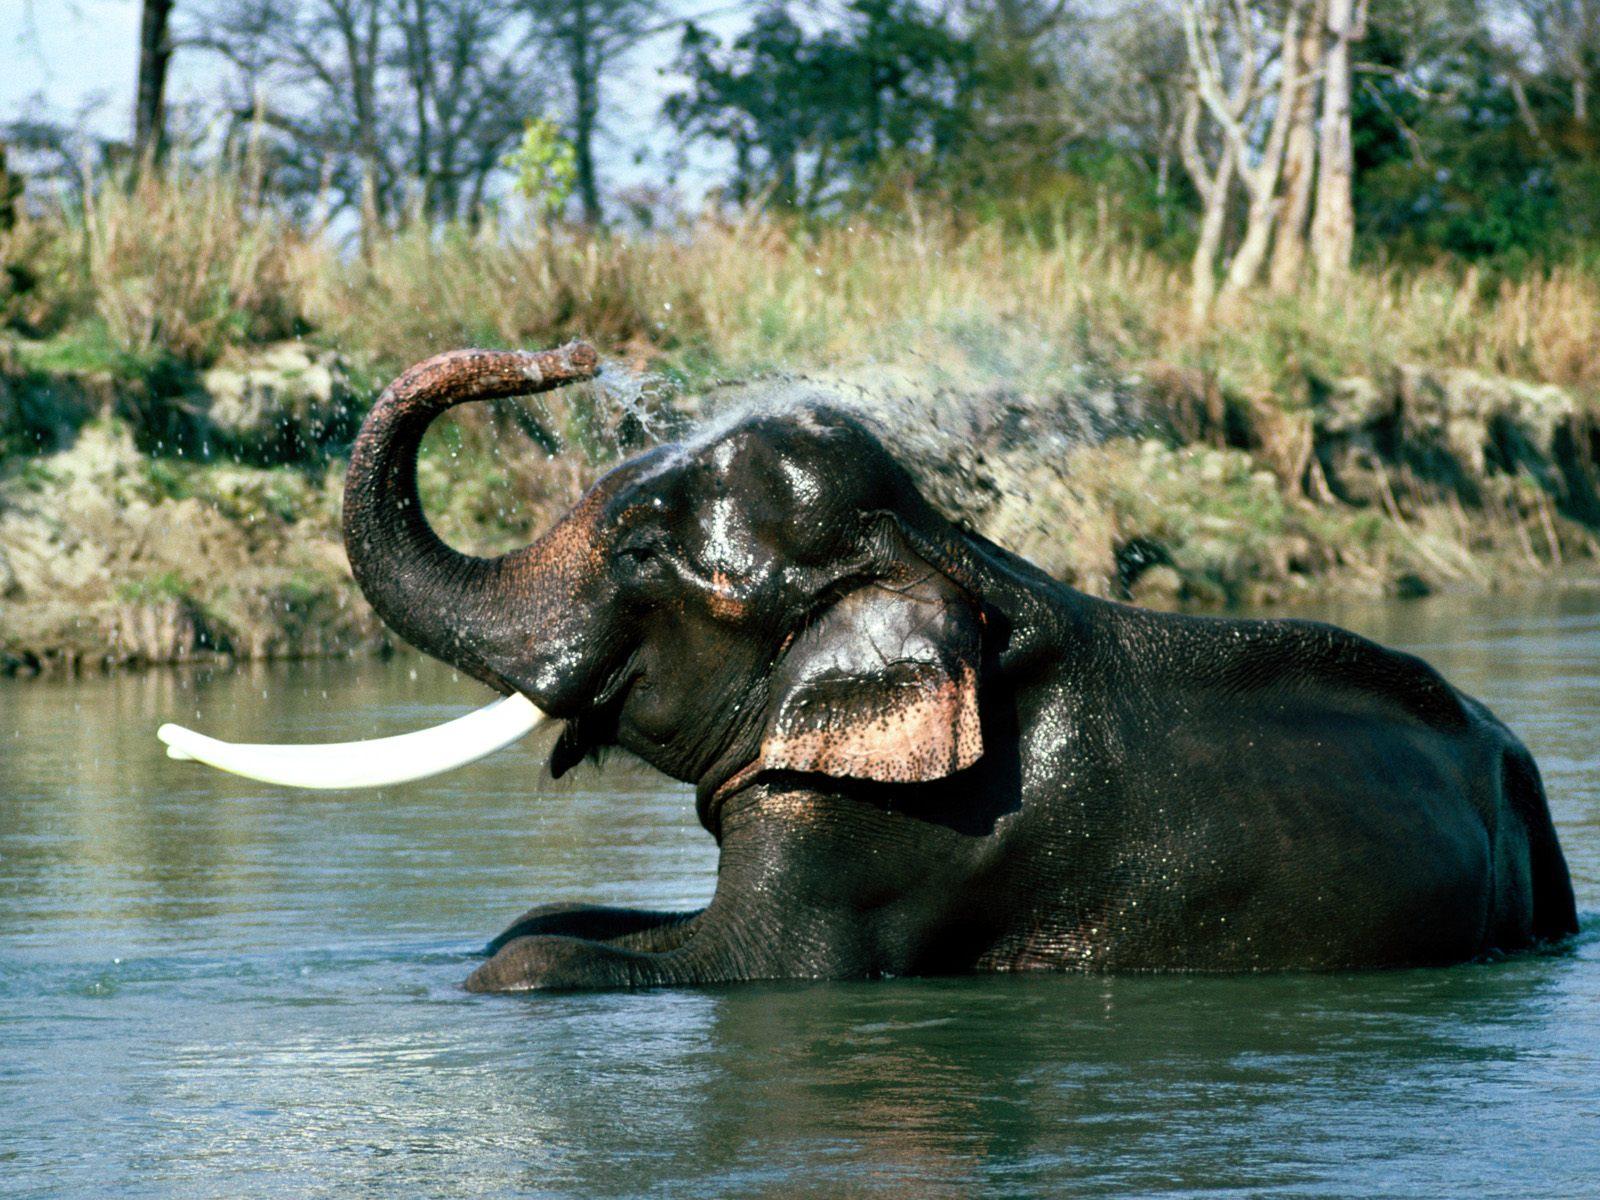 Wallpaper download elephant - Indian Elephants High Quality Wallpapers Free Download Wallpapers